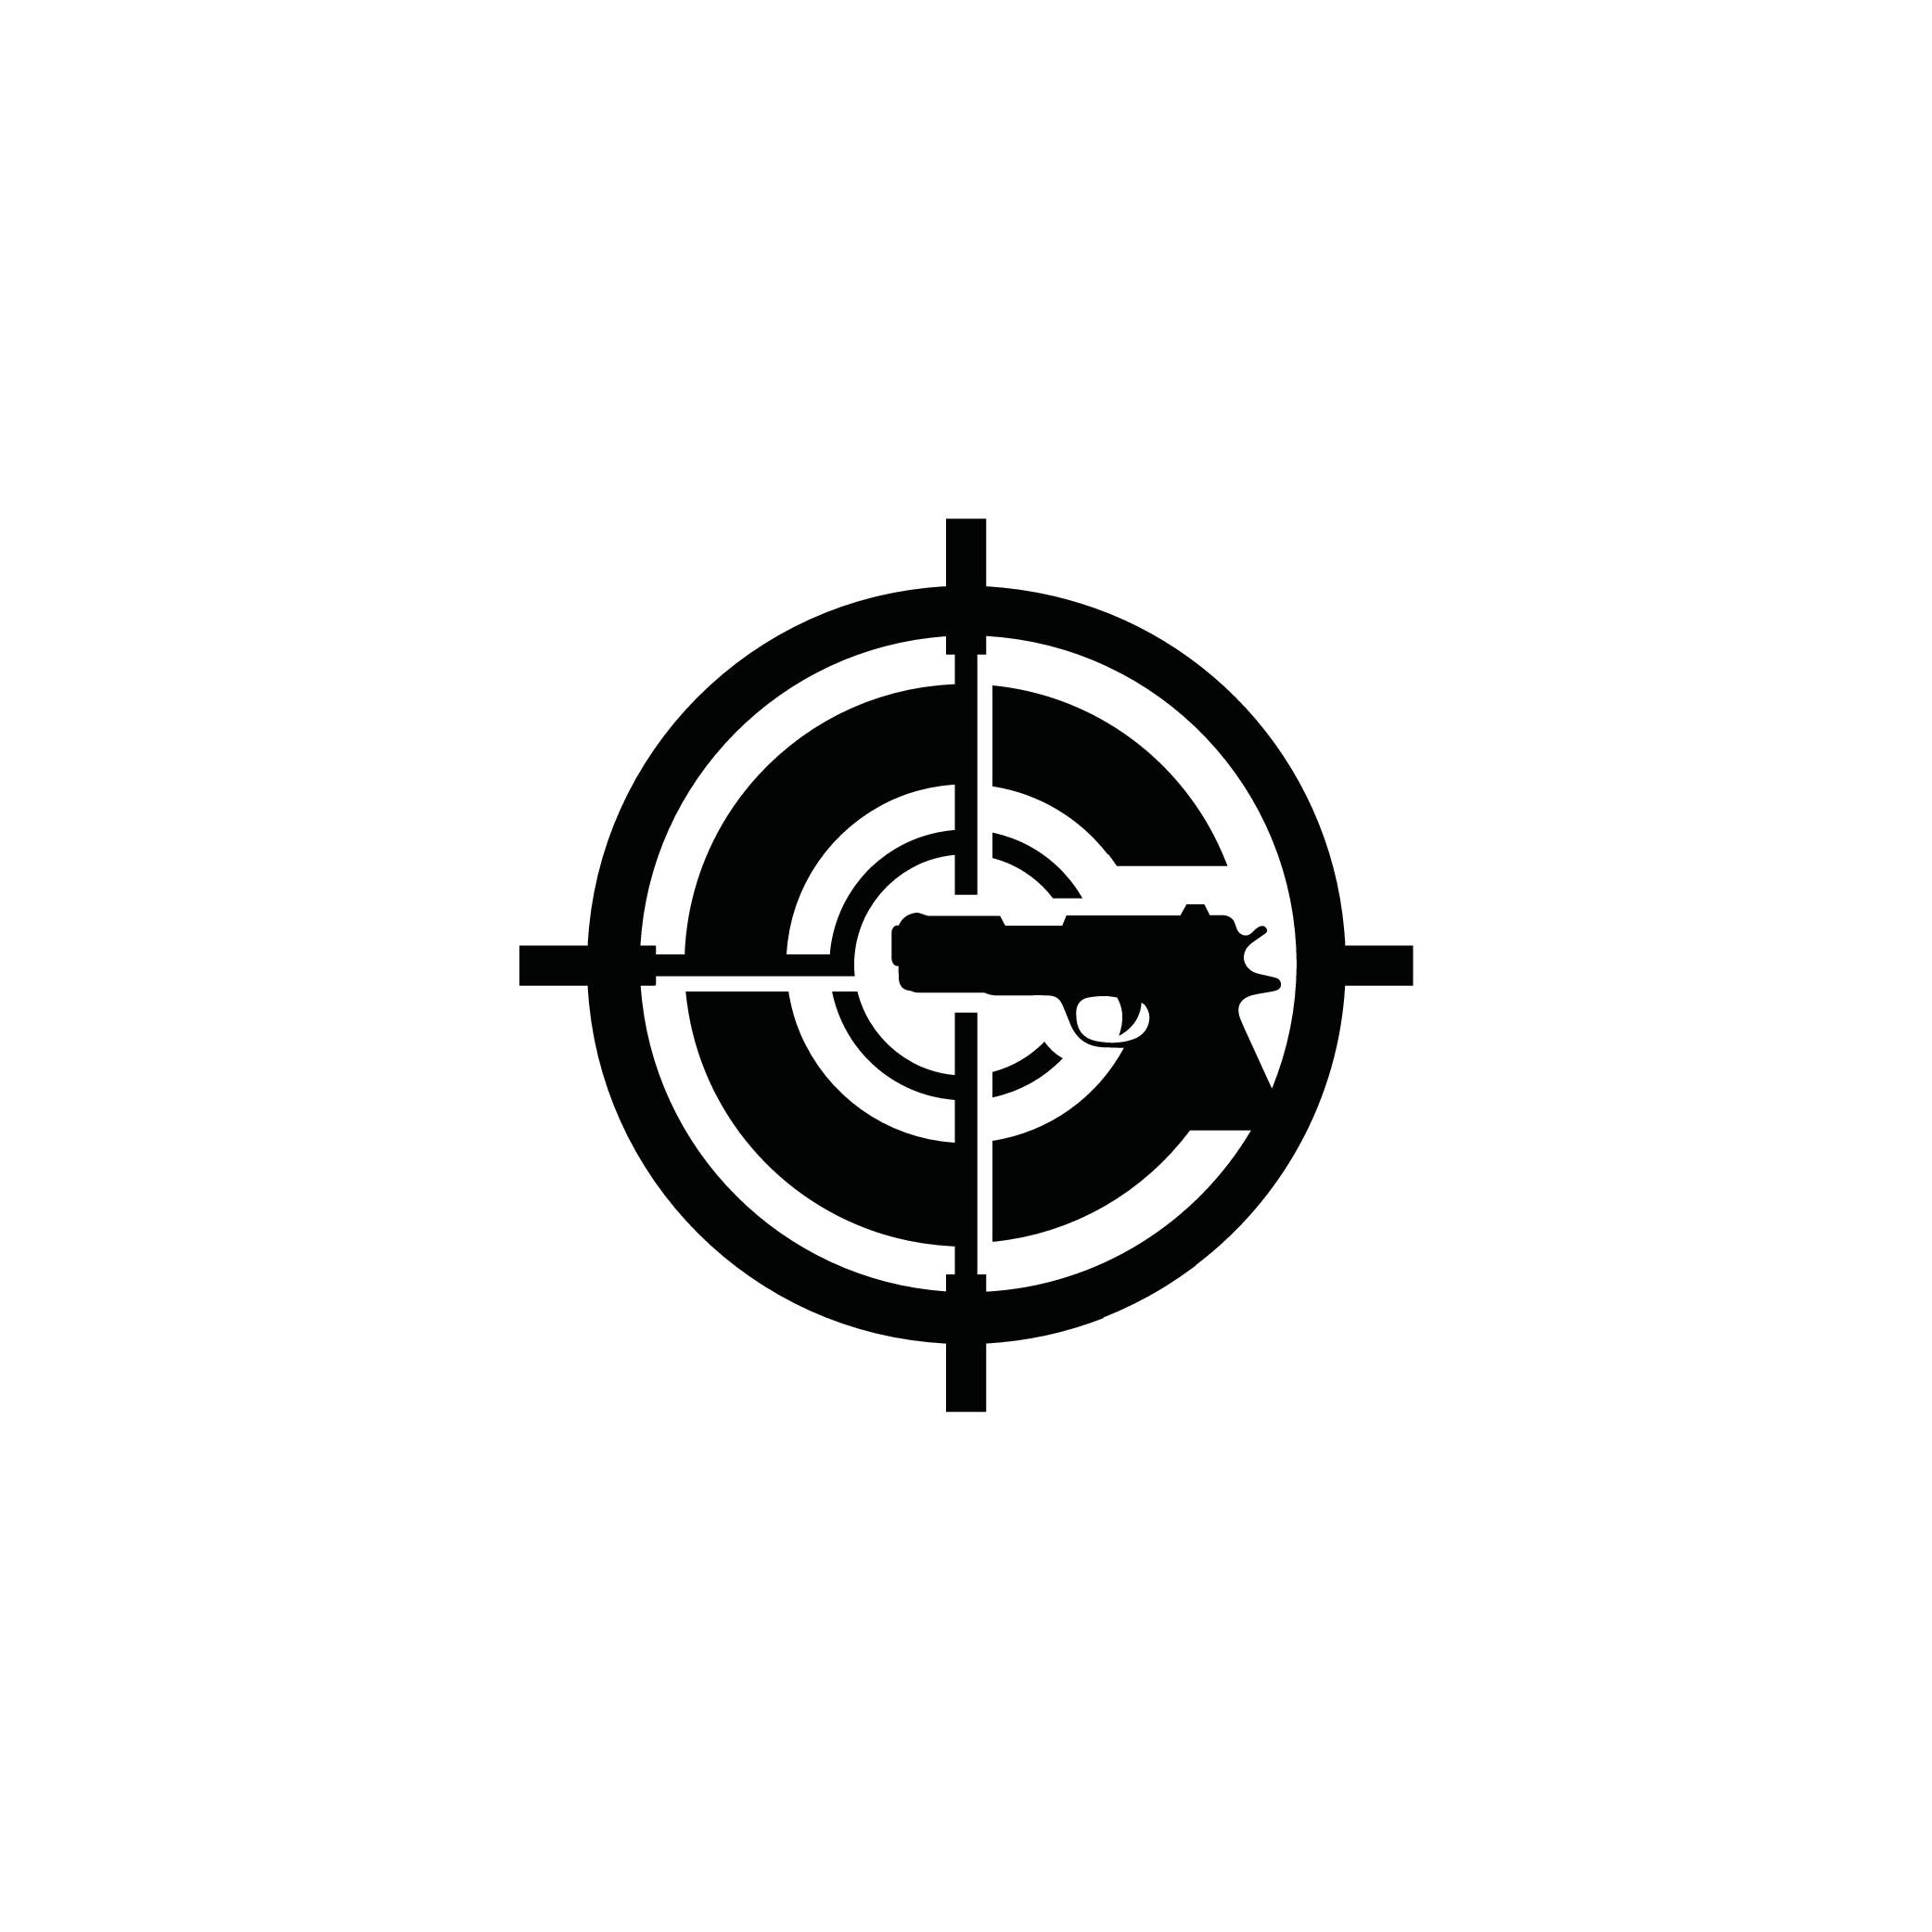 new gun range needs powerful logo